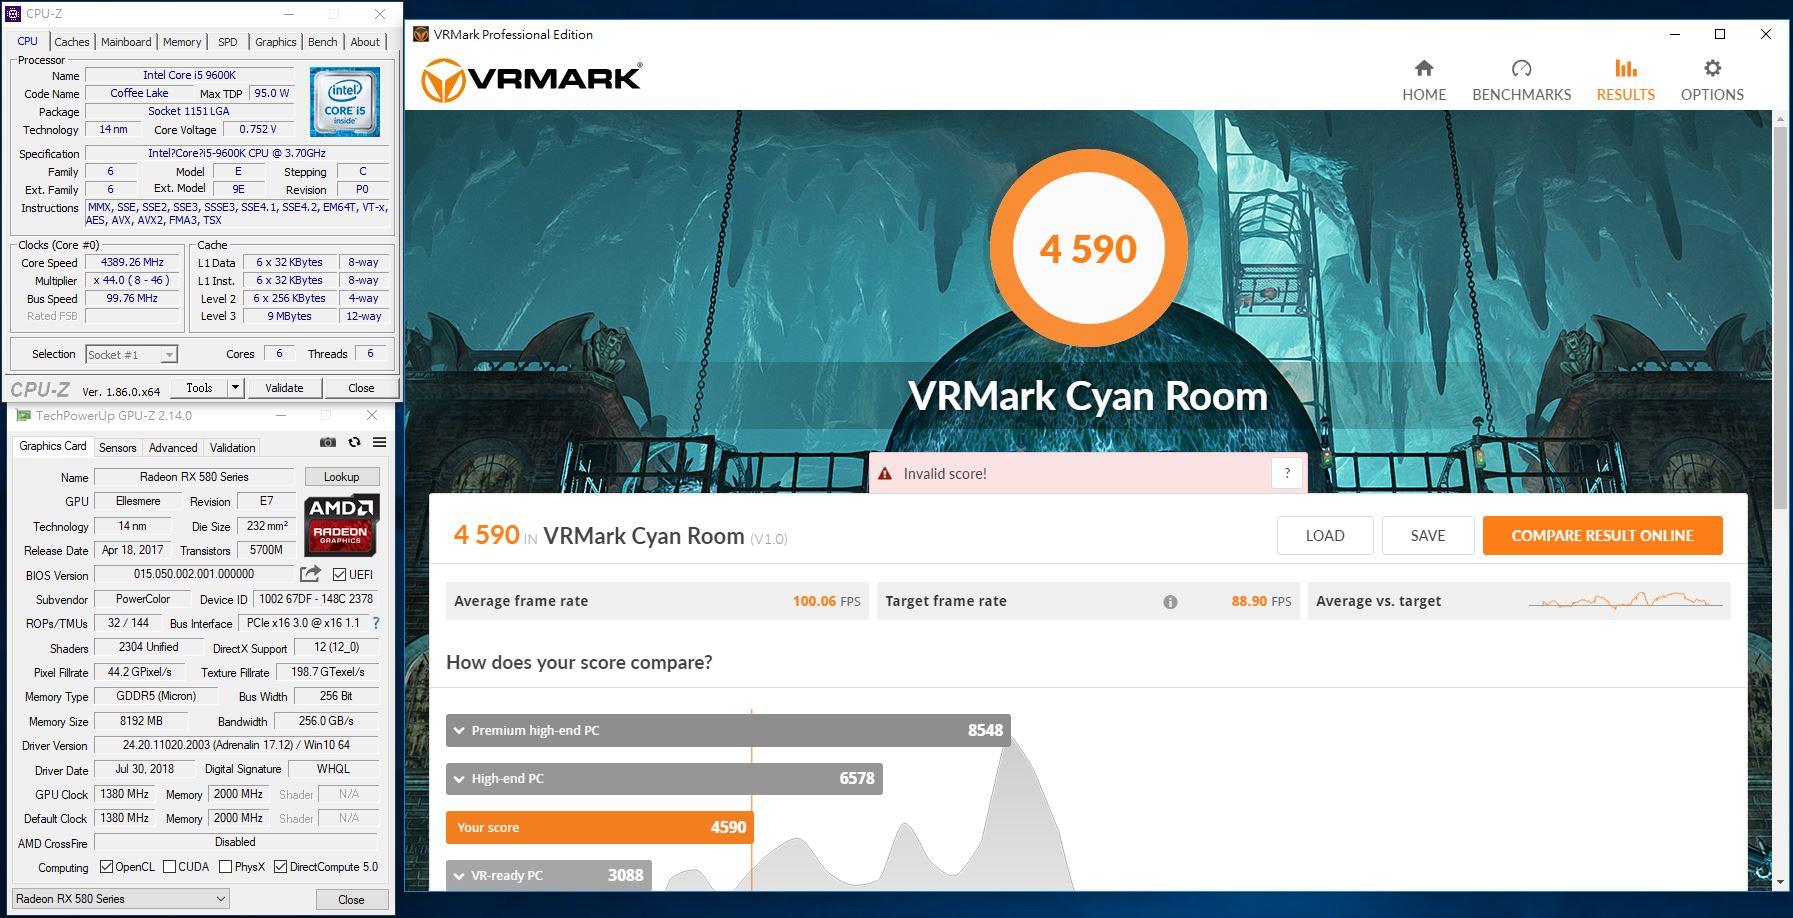 VRMark_C.JPG